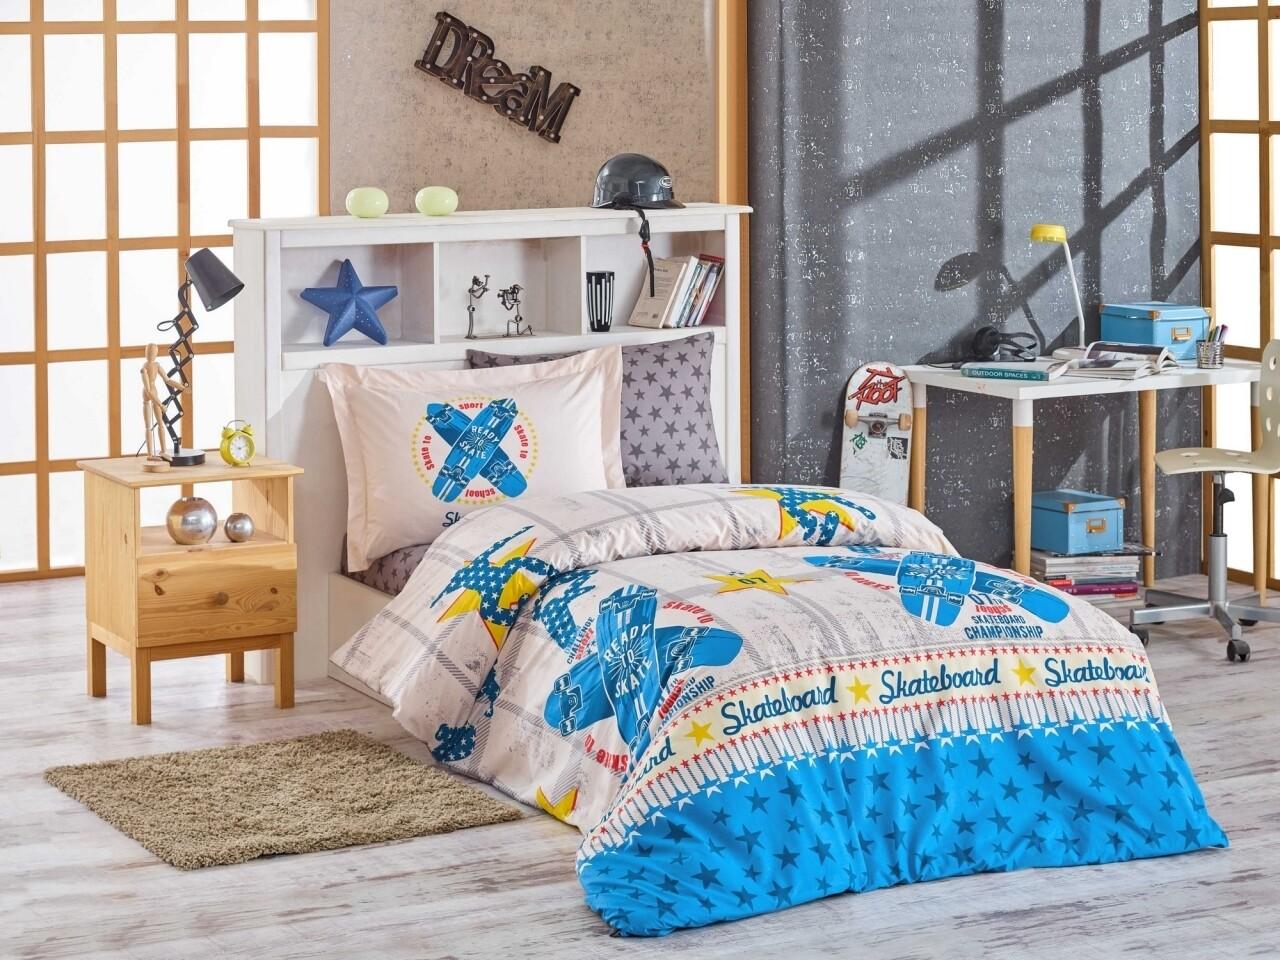 Lenjerie de pat pentru o persoana, 3 piese, 100% bumbac poplin, Hobby, Skateboard, albastru/bej